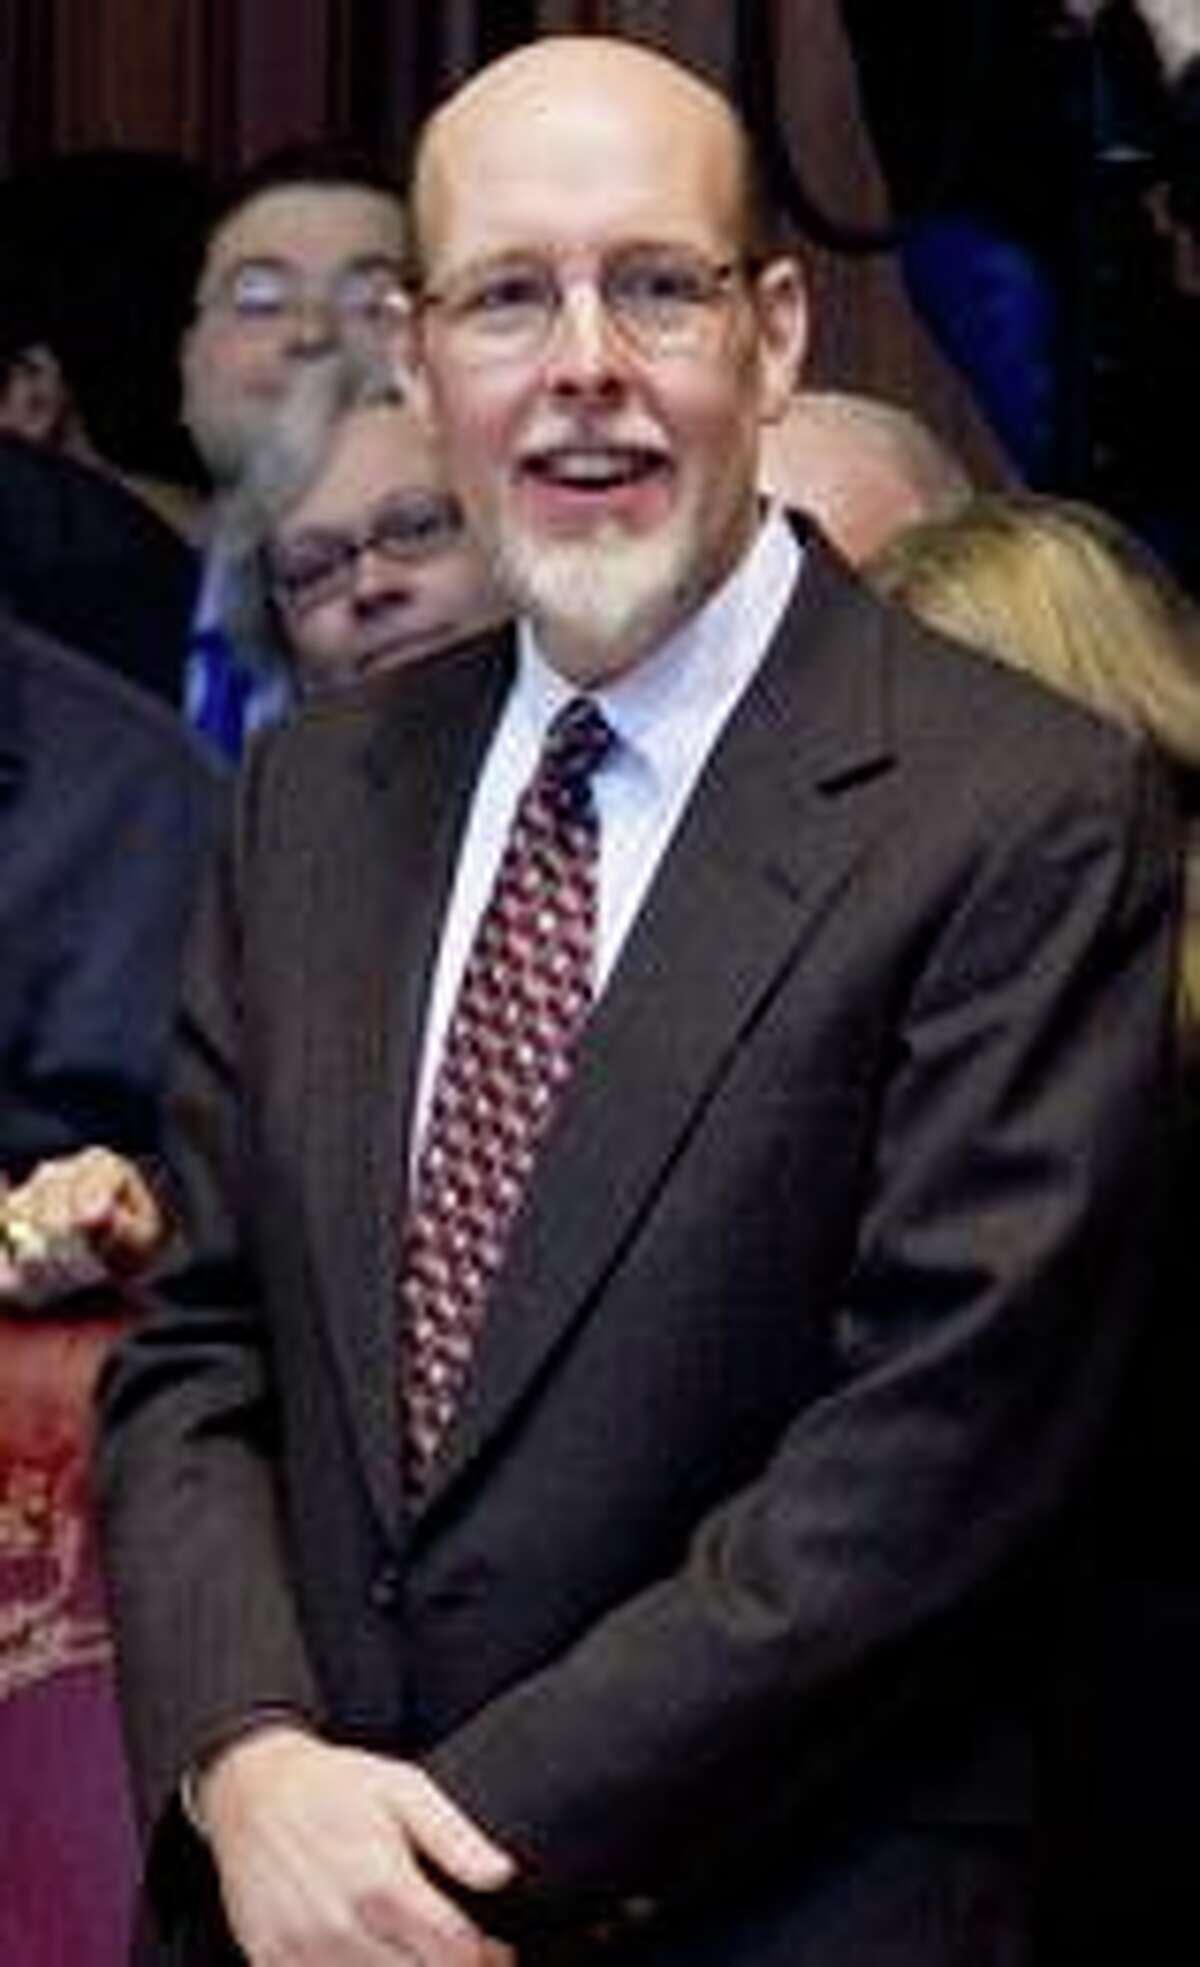 Former state Sen. Joe Markley